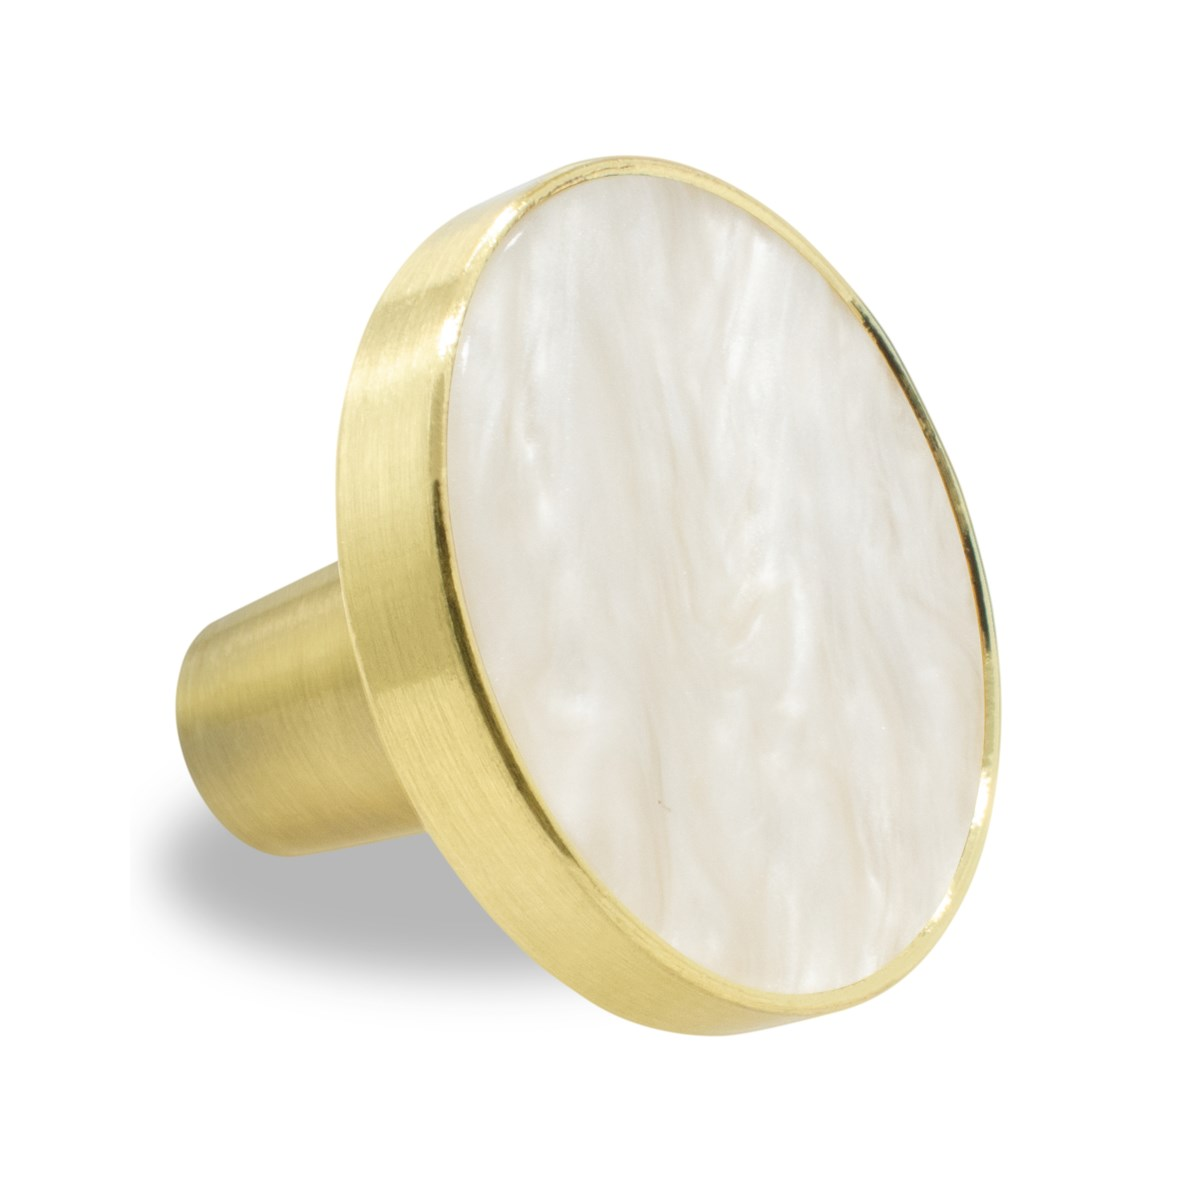 6PC Crema Pearl Stone 30MM Knob Pull Handles w/ Brushed Gold Finish (12 set)